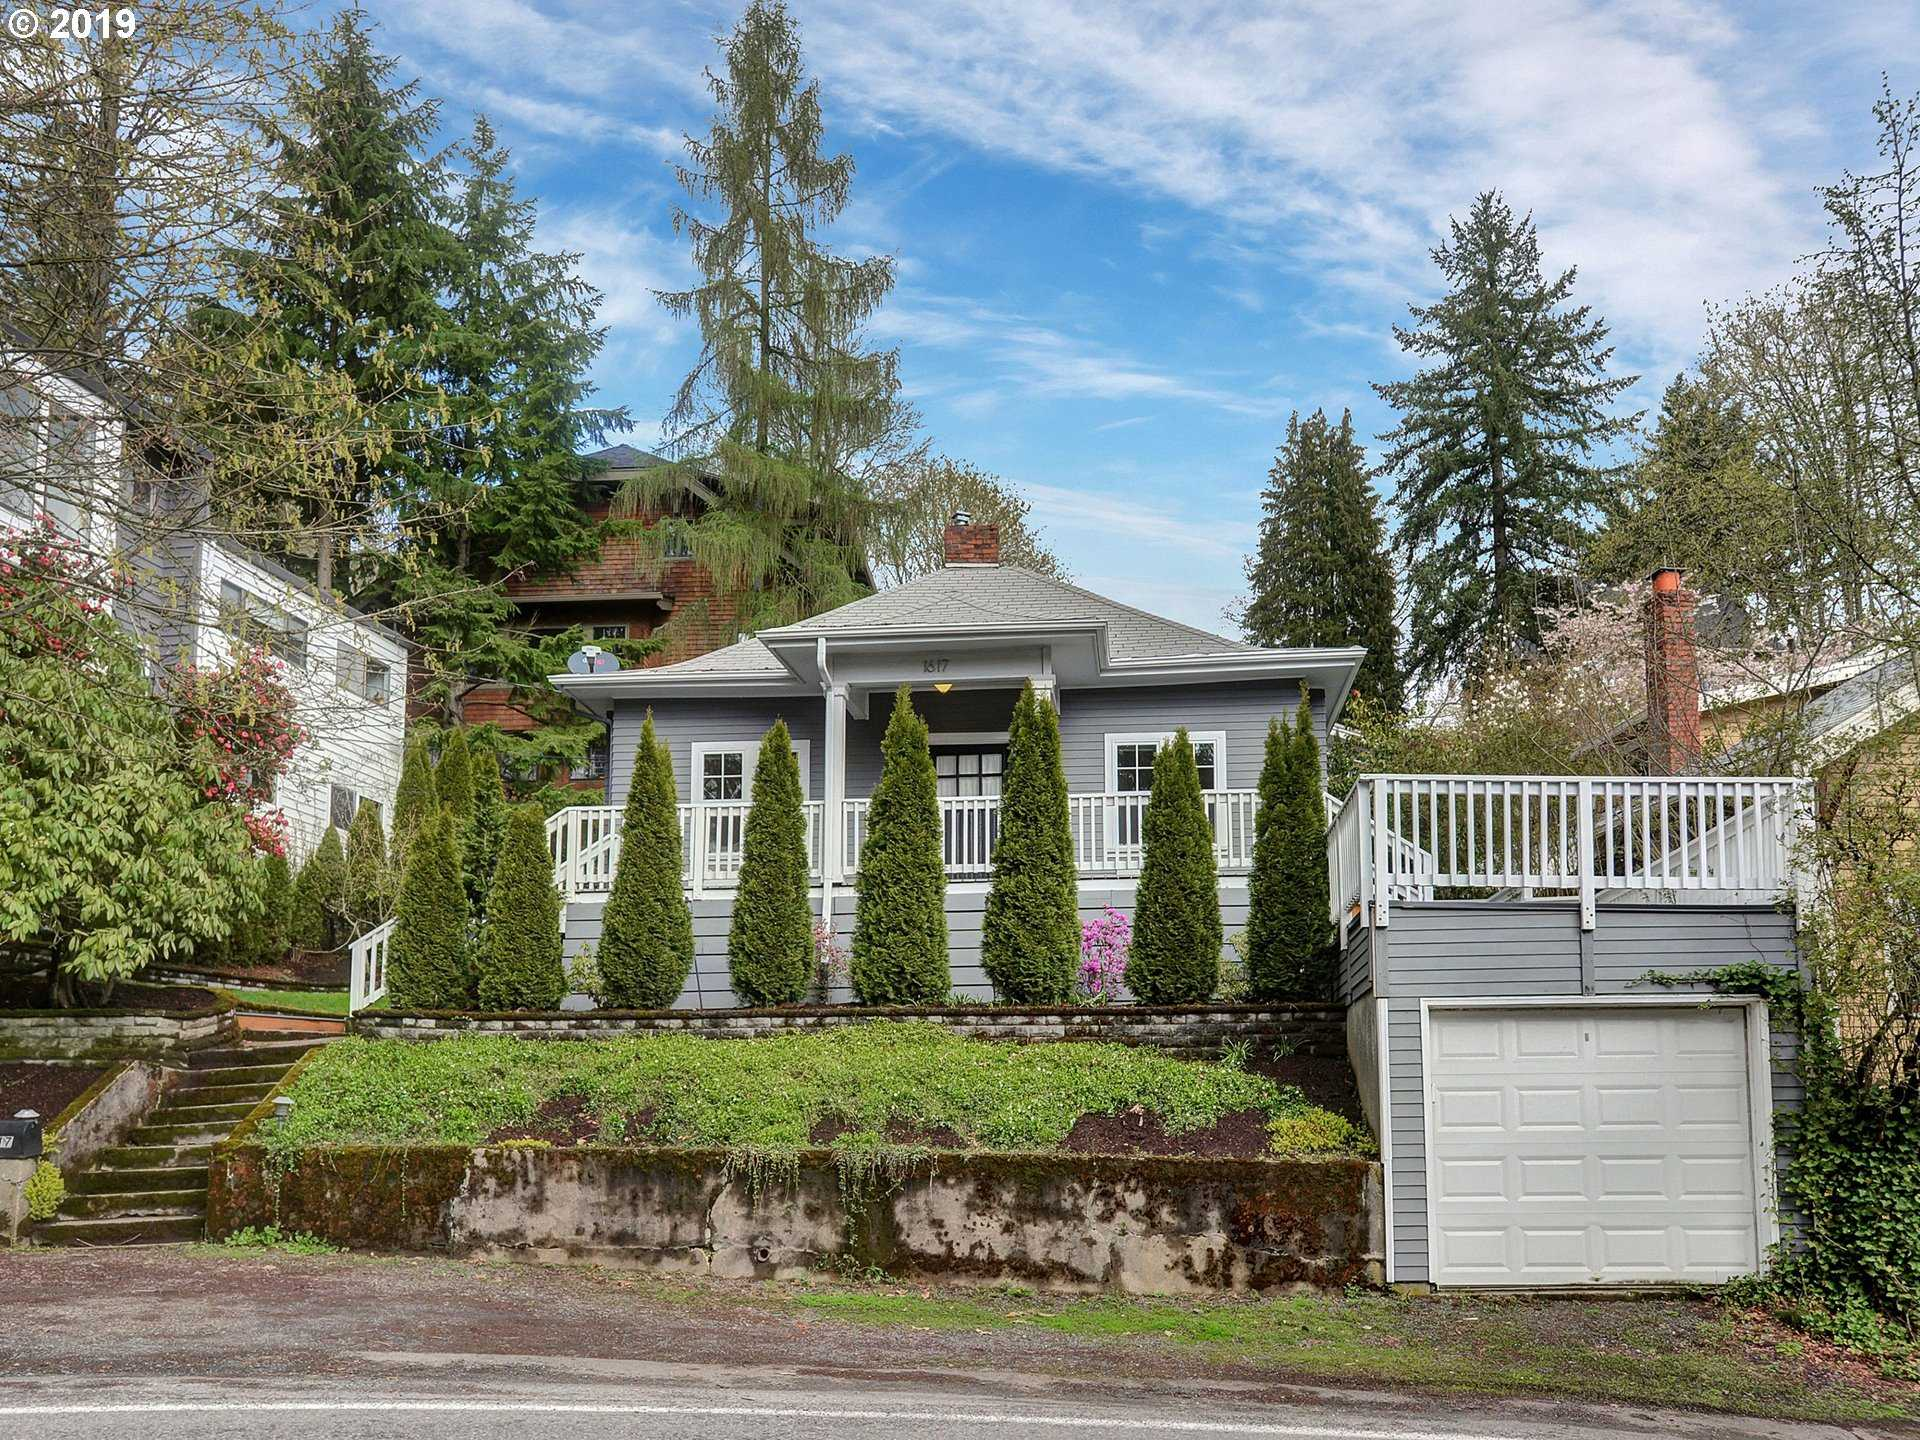 $459,900 - 2Br/2Ba -  for Sale in Portland Heights, Portland